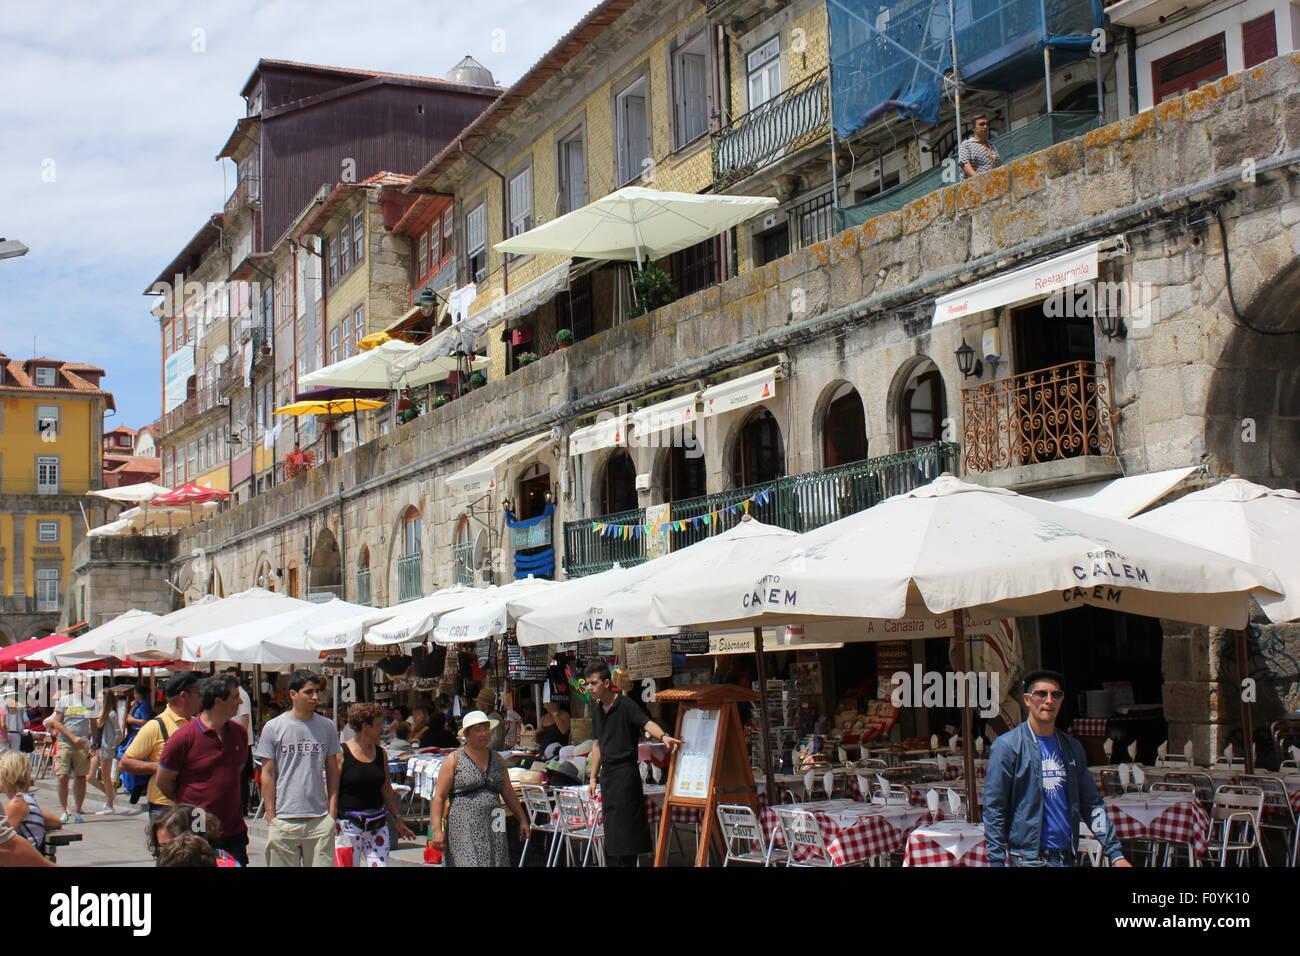 Restaurants with shade umbrellas in Porto, Portugal - Stock Image